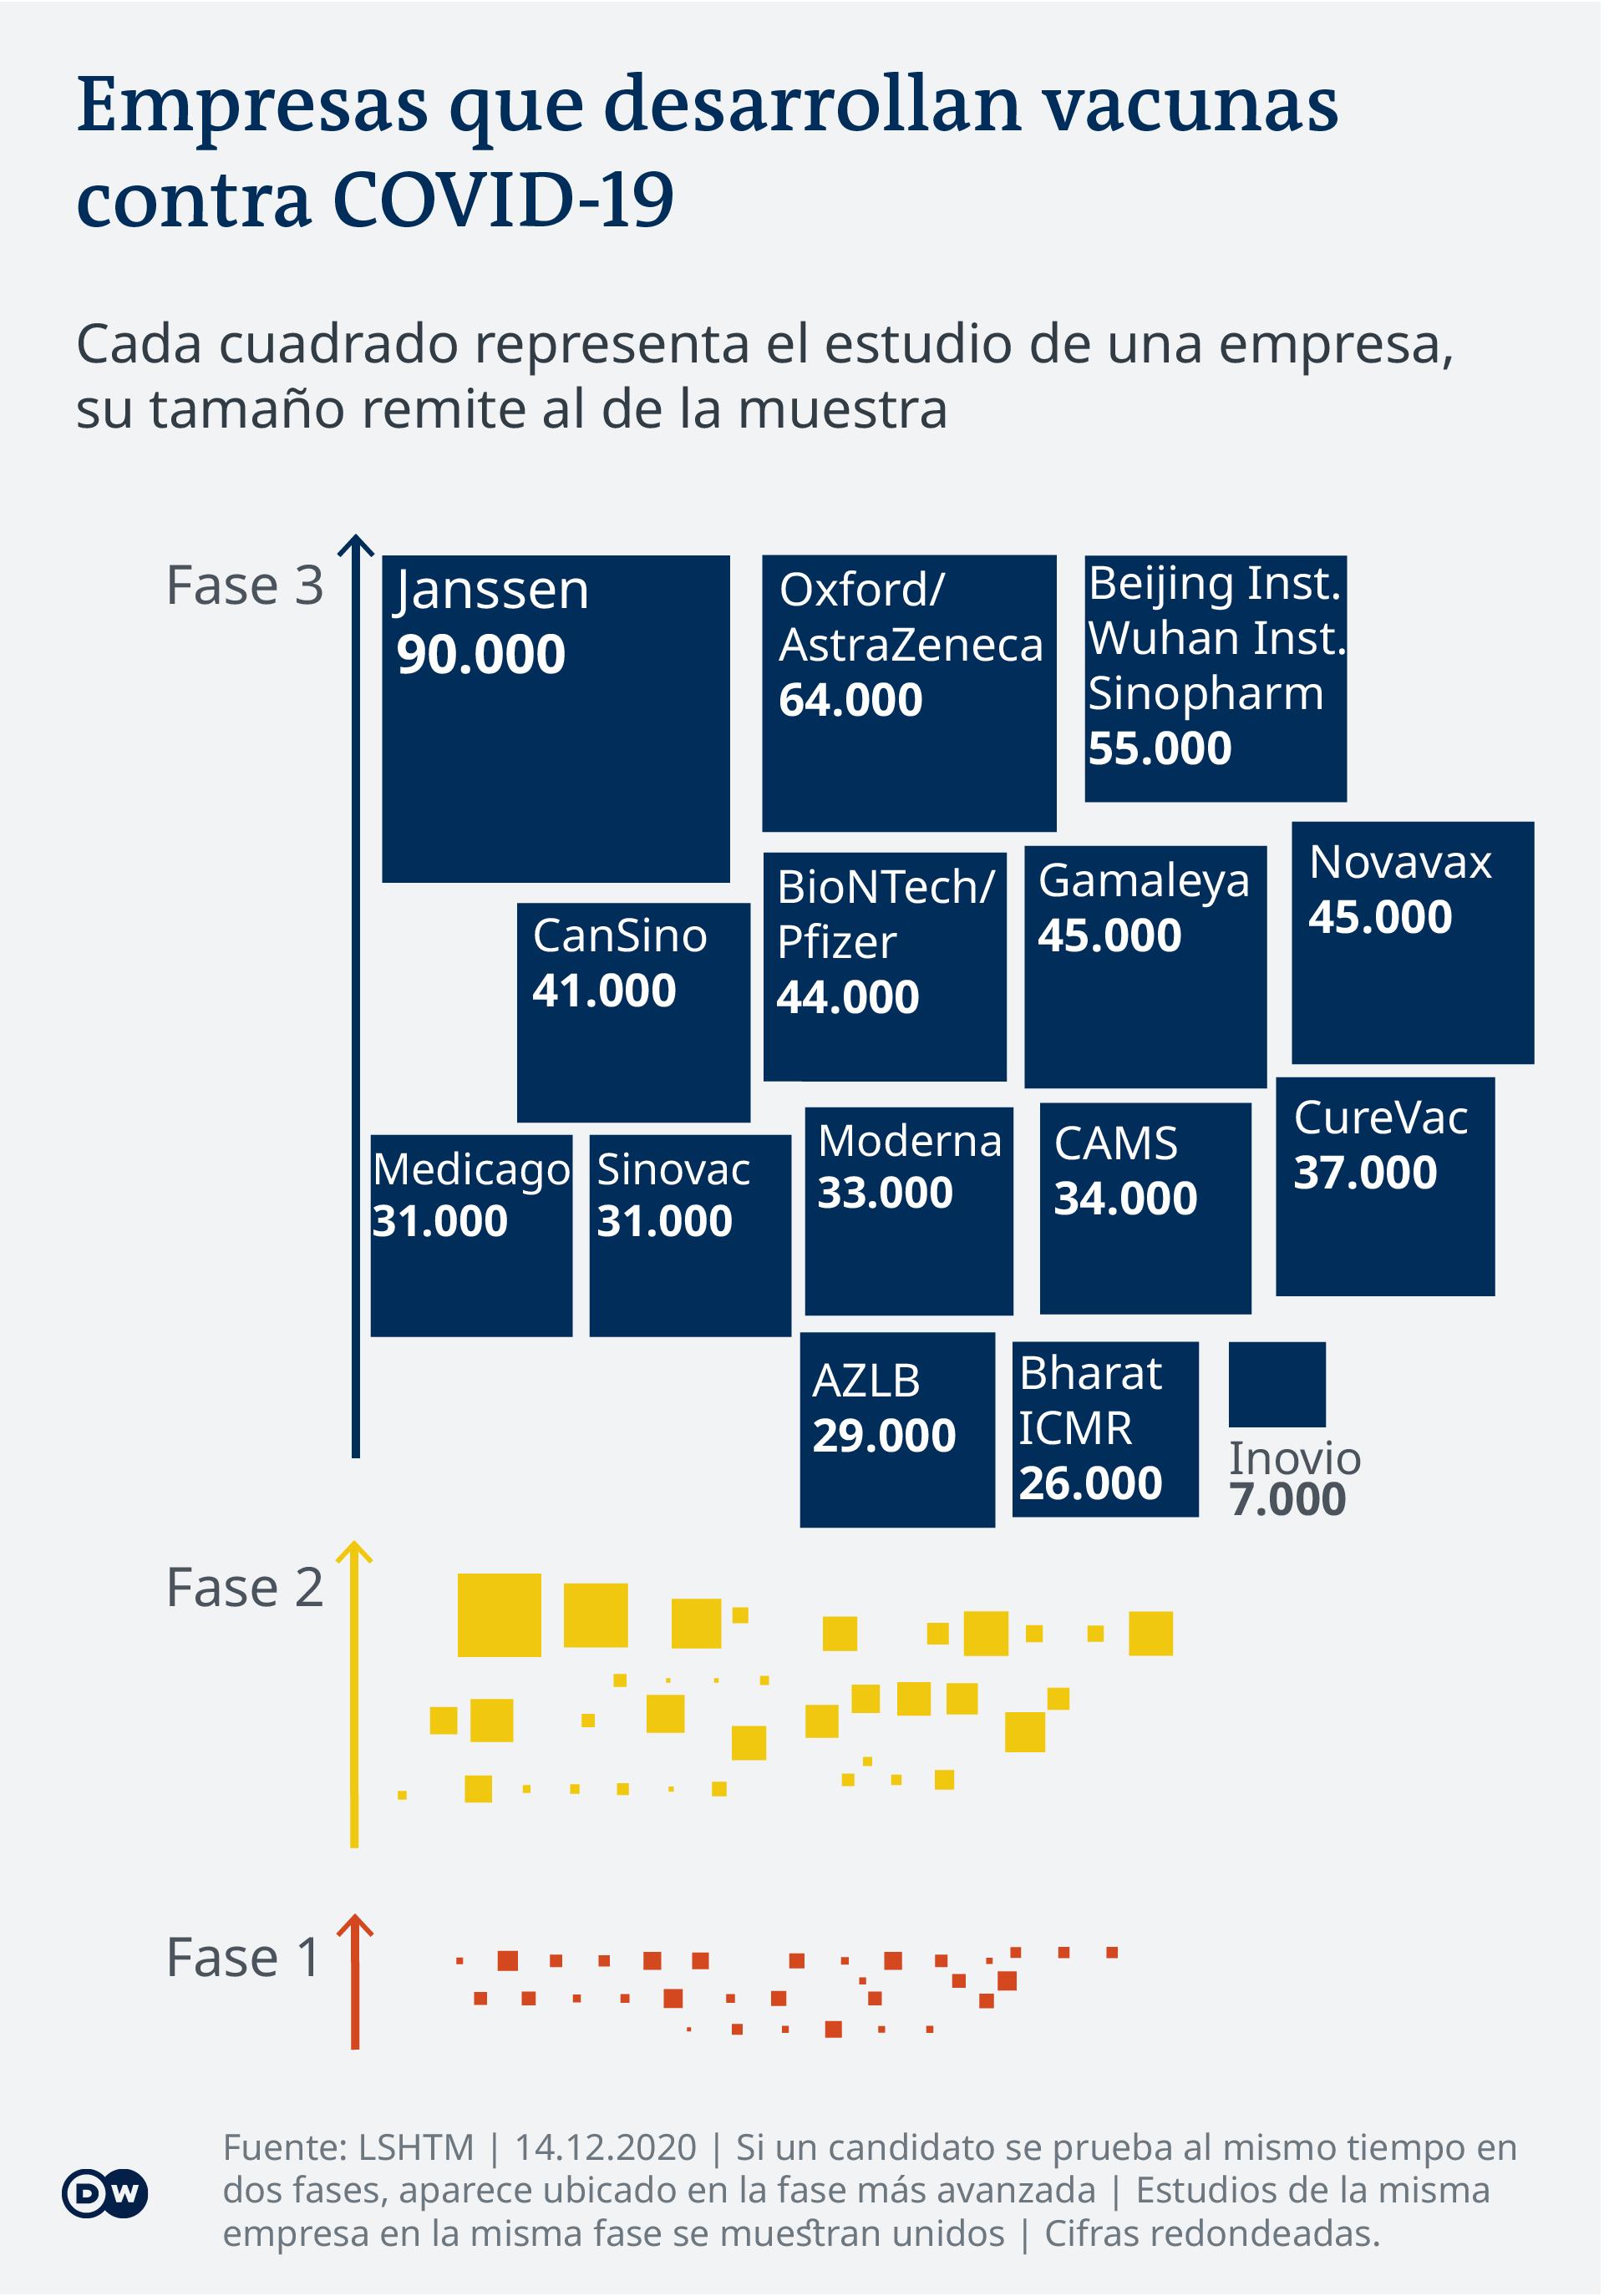 Data visualization - COVID-19 vaccine tracker - Research Team - Update 14.12.2020 - Spanish